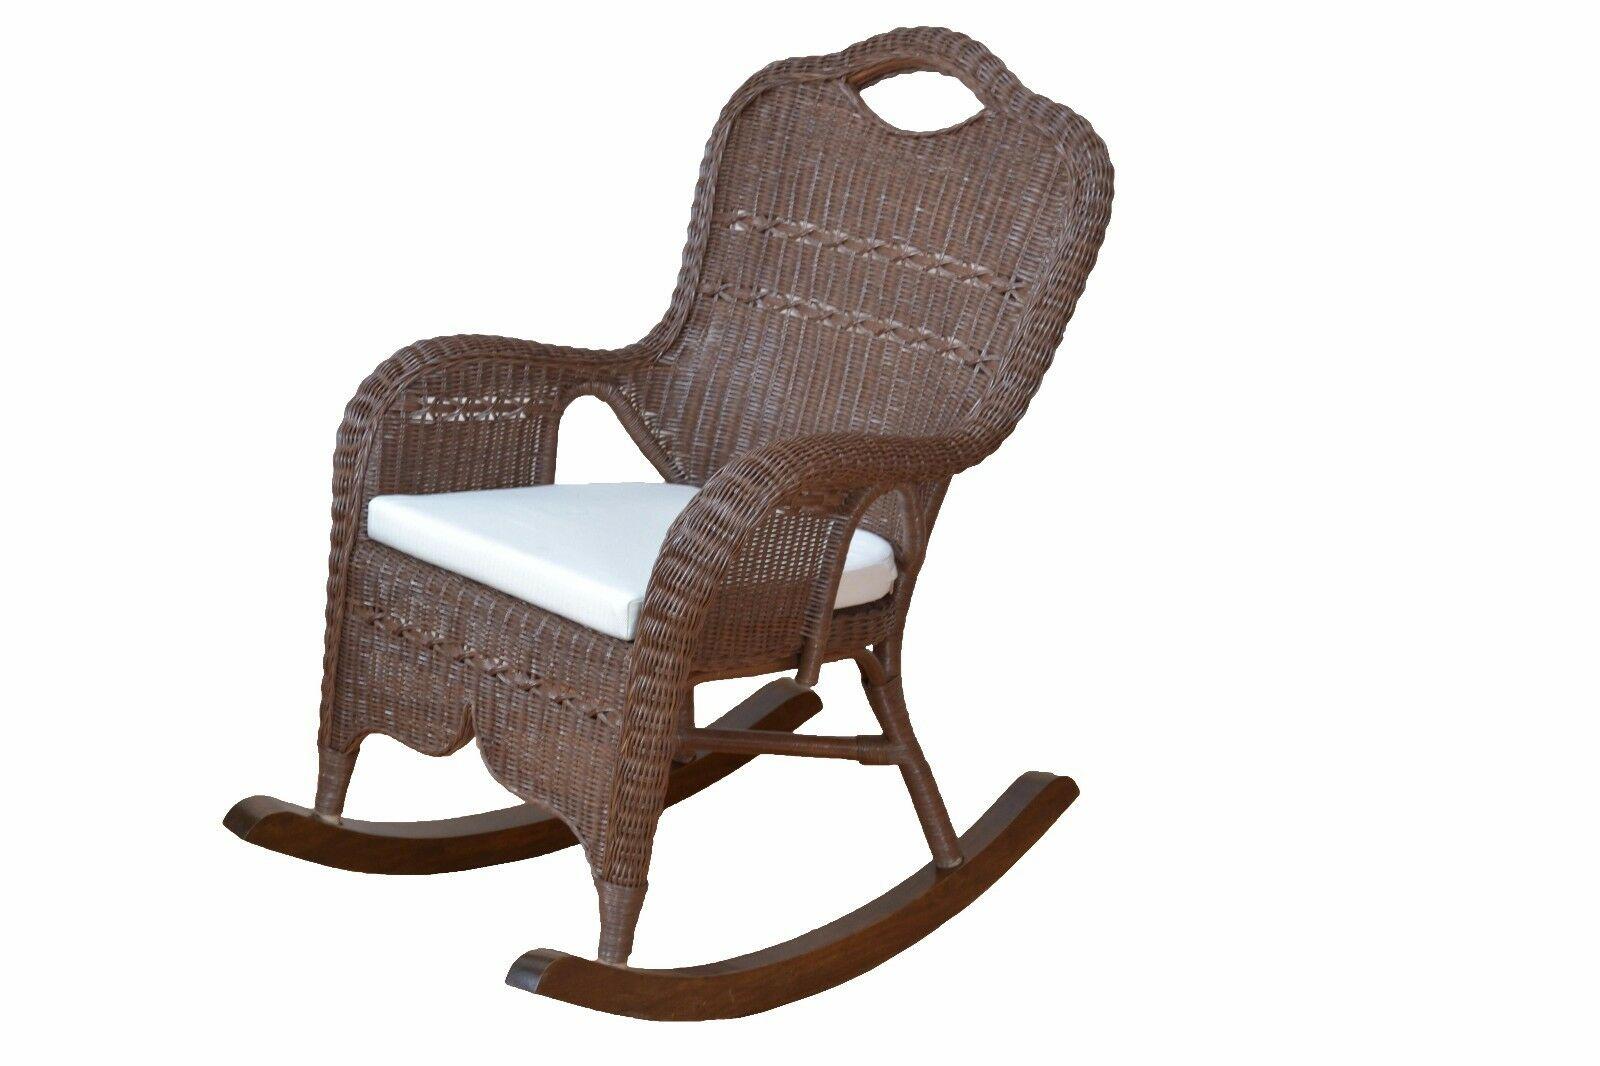 Moderner Schaukelstuhl moderner schaukelstuhl rattan braun gebeizt lackiert rattansessel